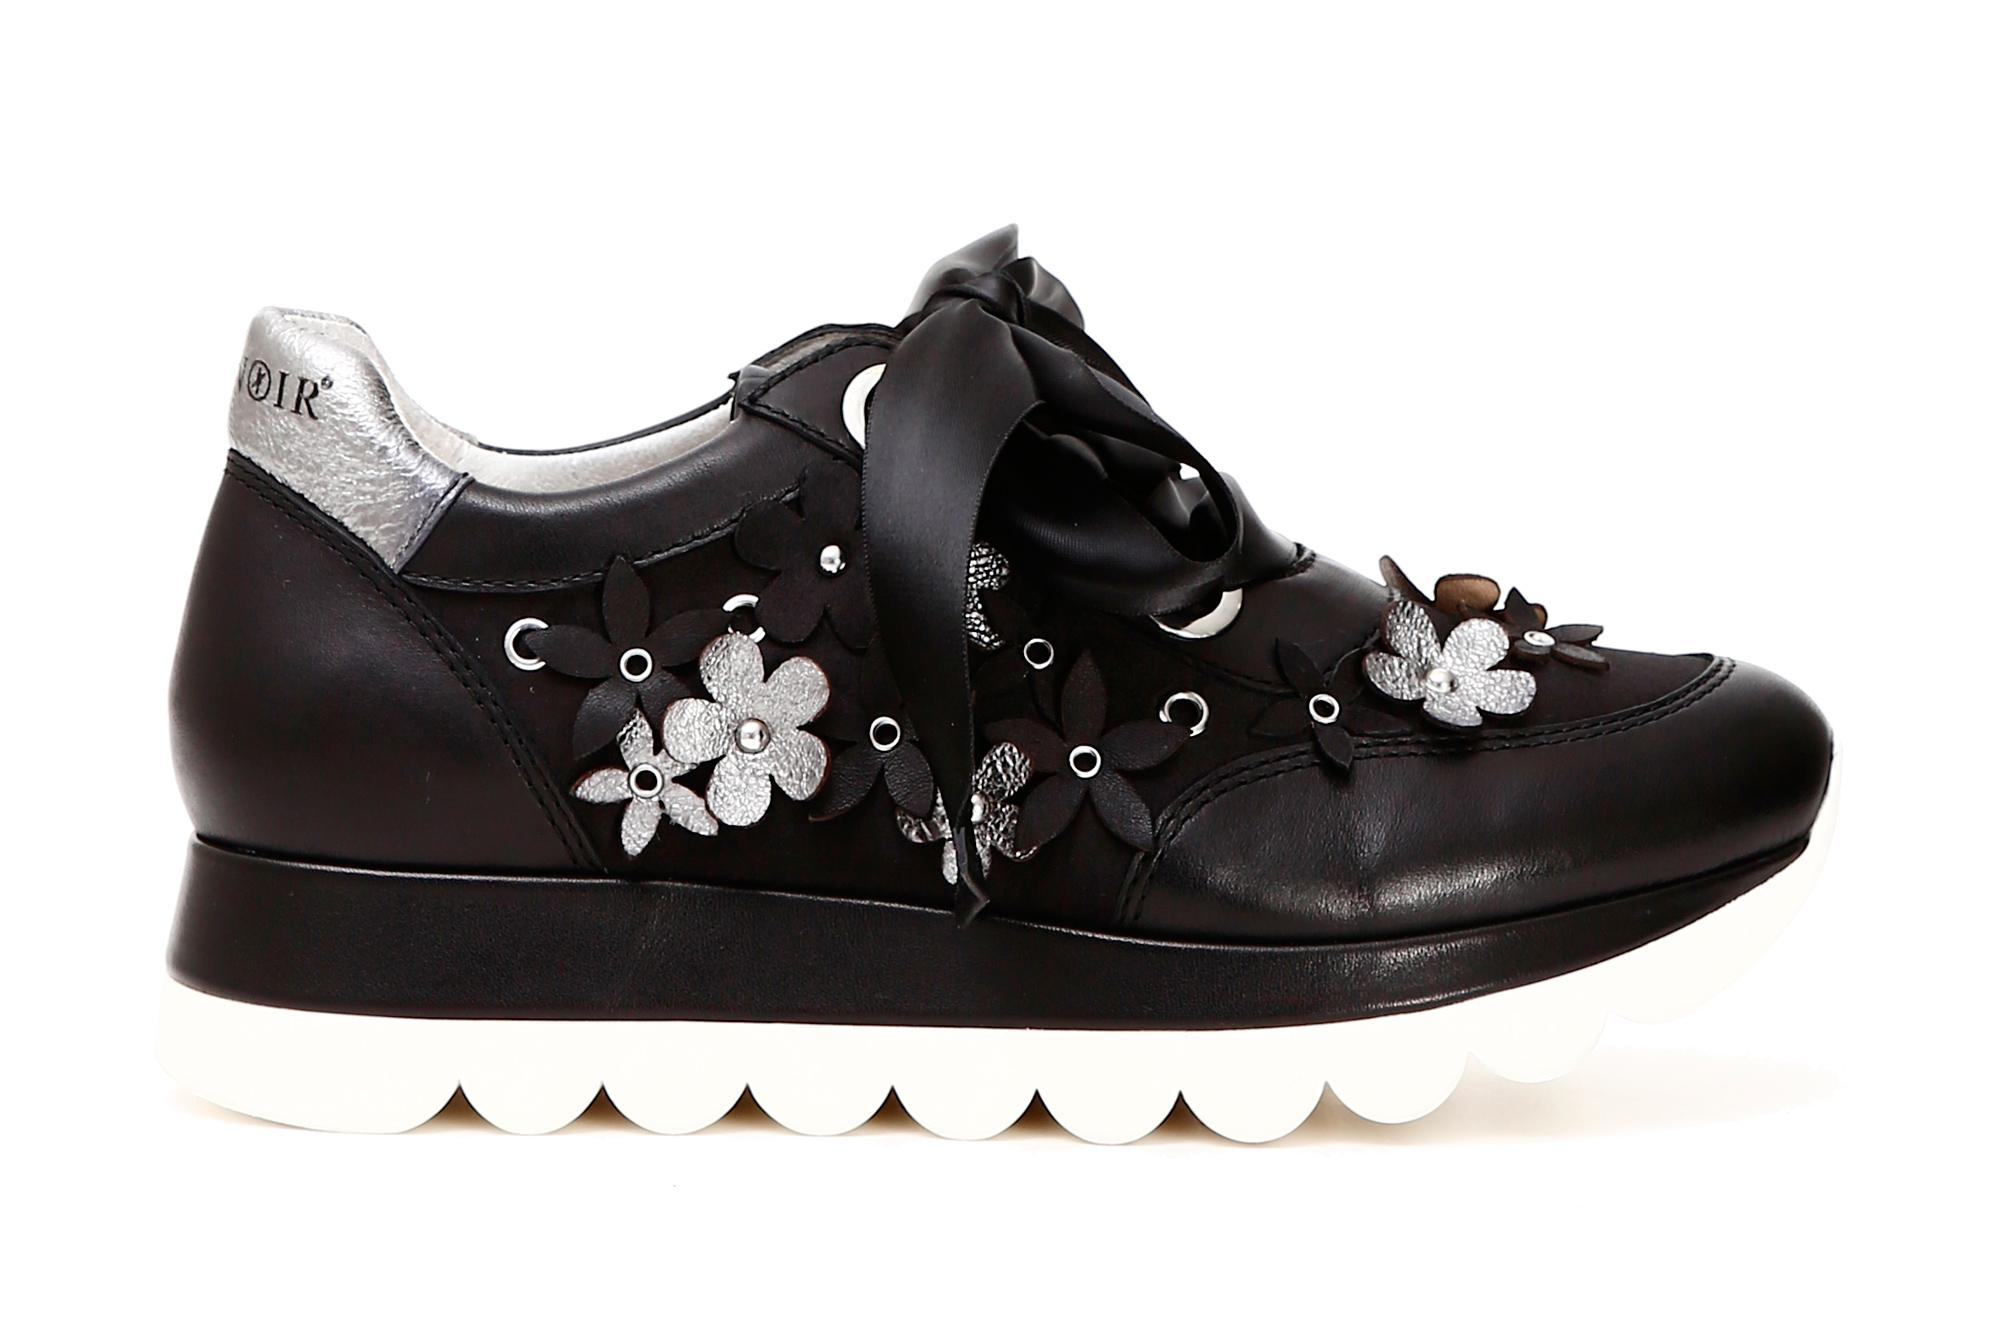 Ca Shott 10152-scarpe - donna sandalo zeppa sandali - 10152-scarpe 792-Cairo-Taupe 9376d8